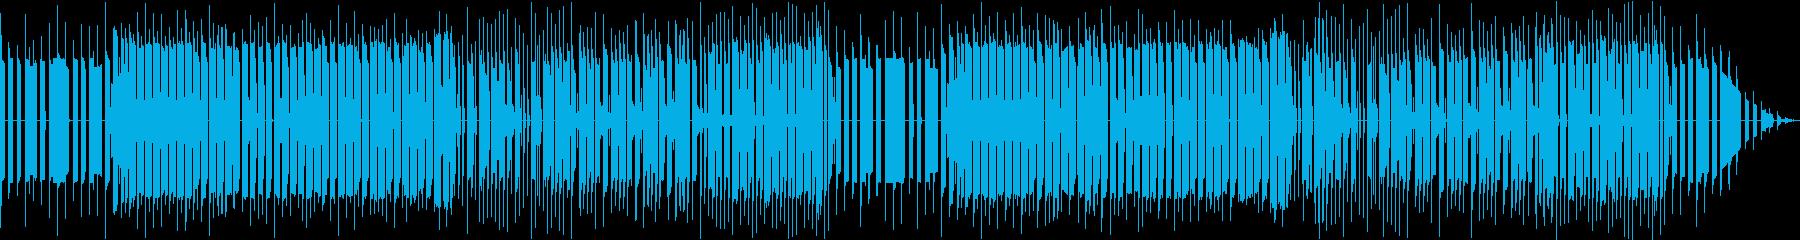 【8bit】不気味でコミカルなパレードの再生済みの波形